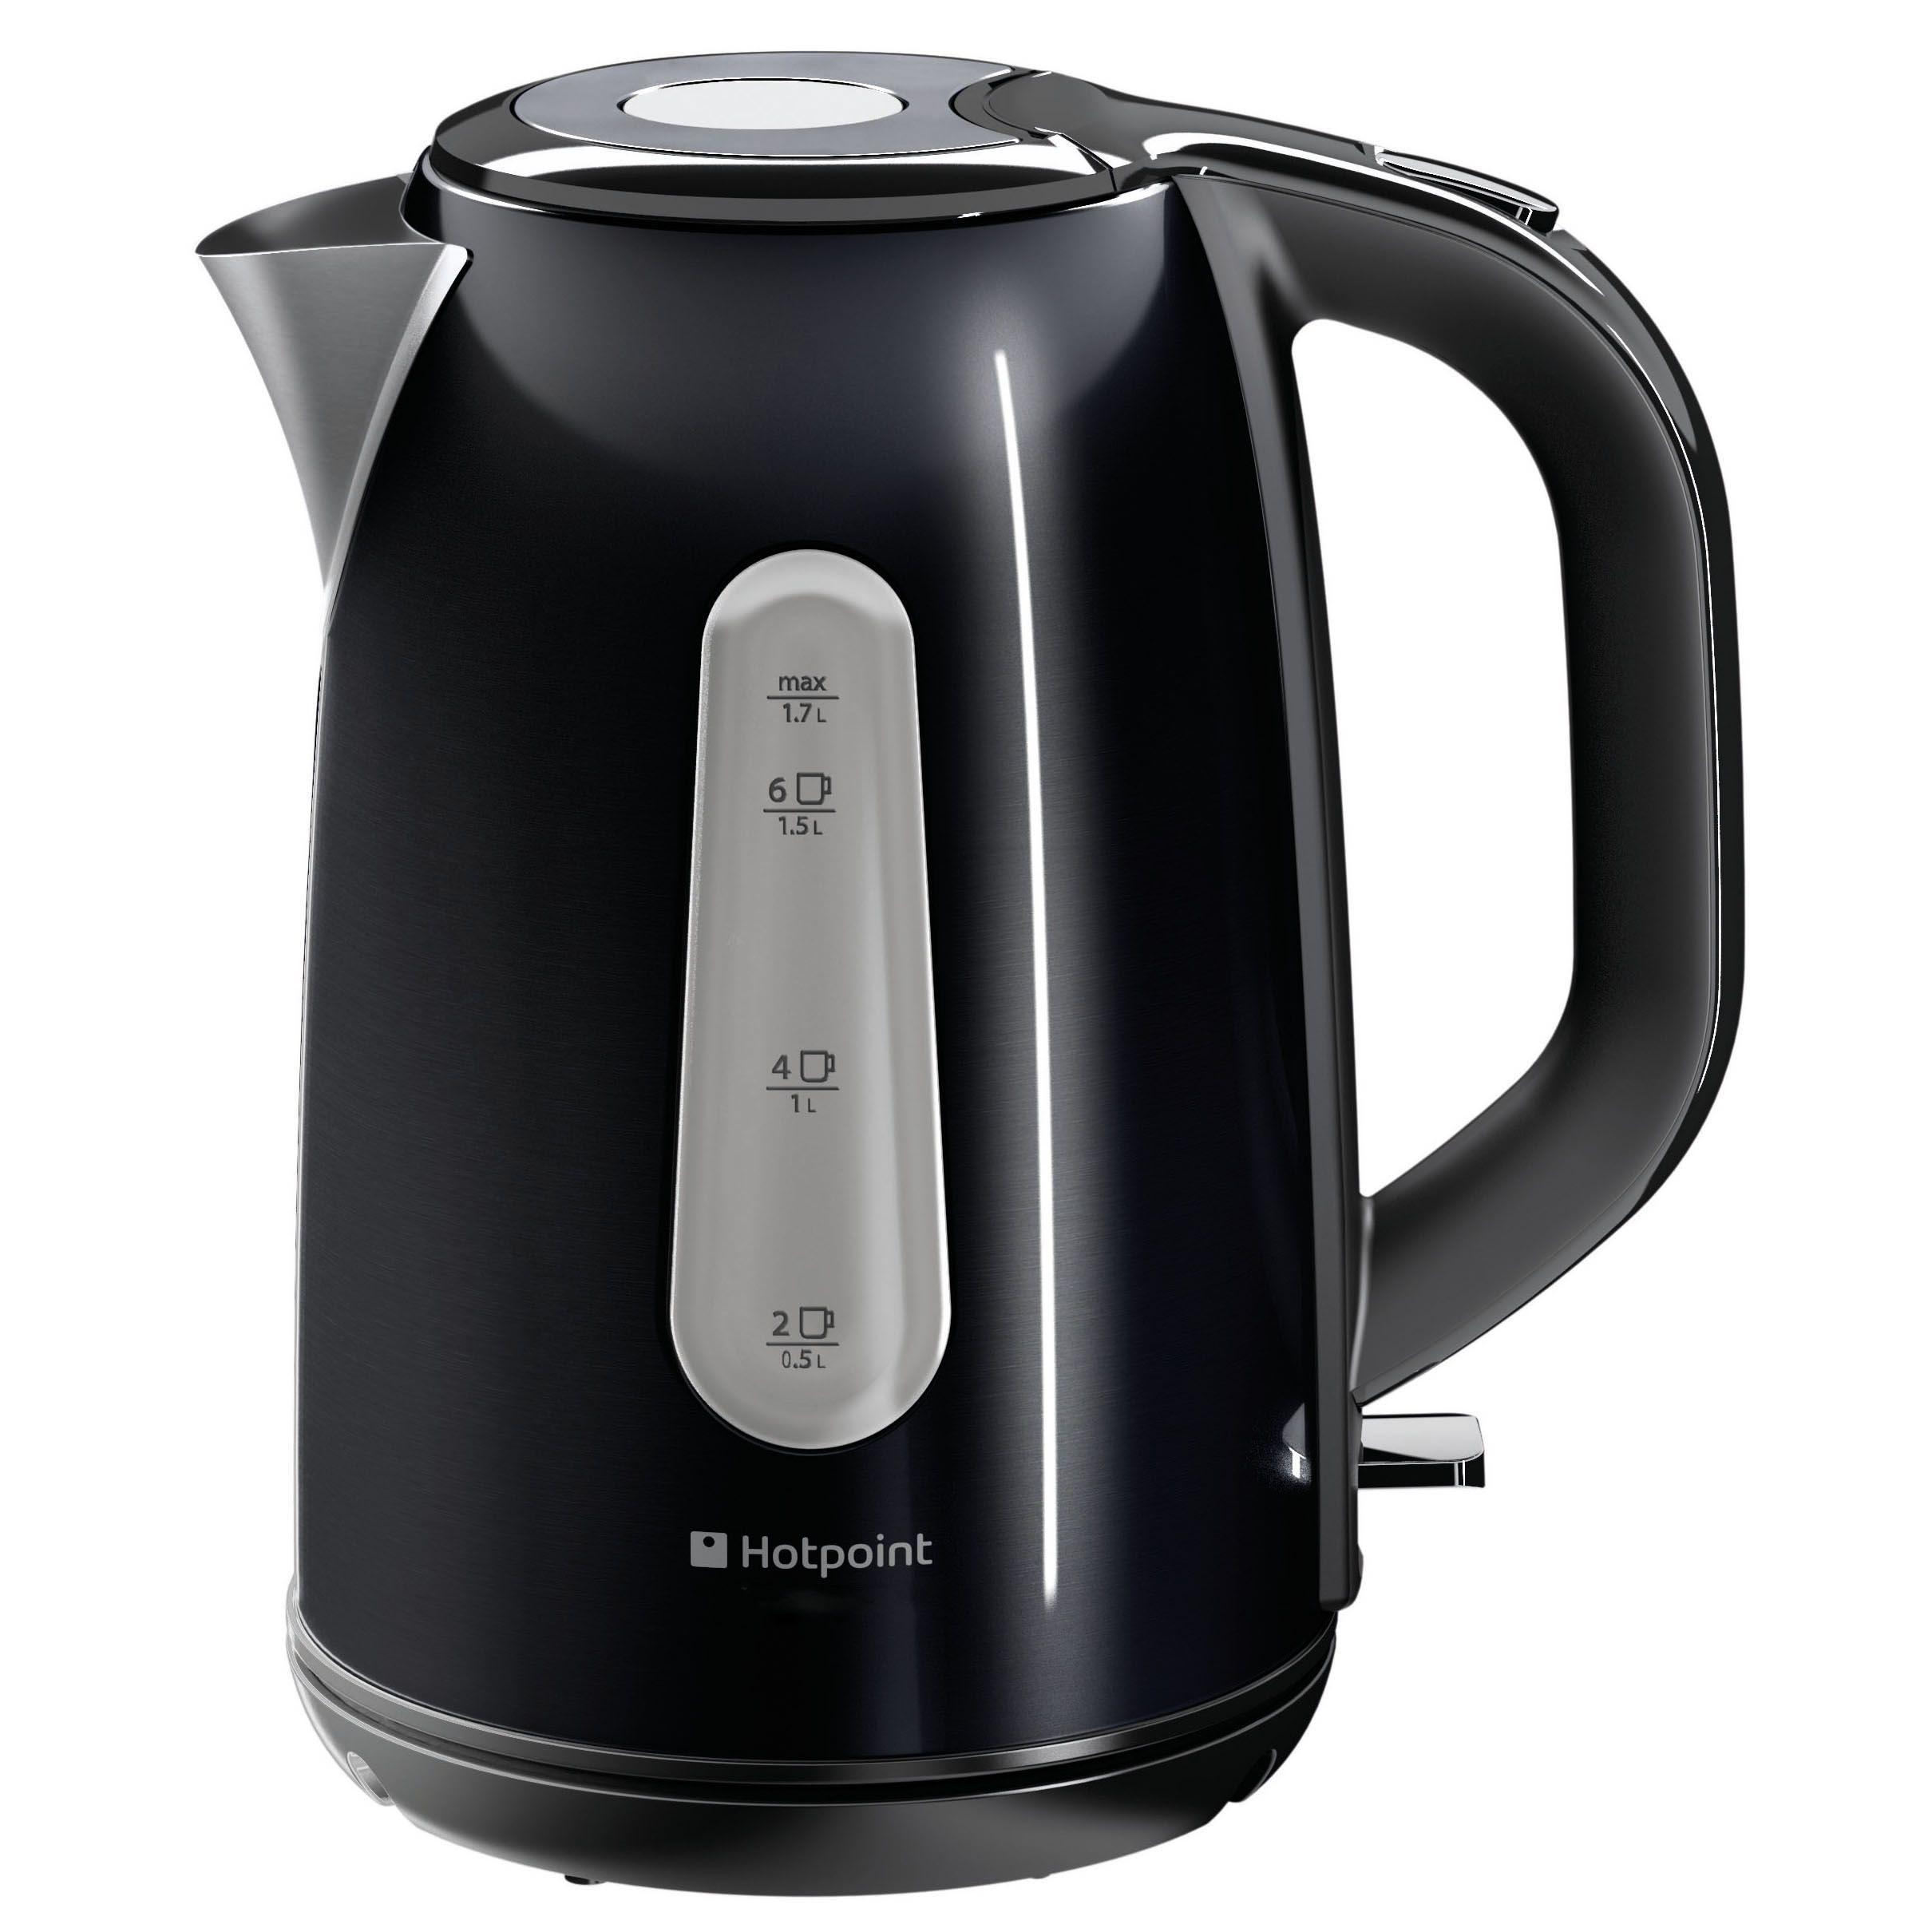 hotpoint wk30mdbk0 electric kettle black departments. Black Bedroom Furniture Sets. Home Design Ideas